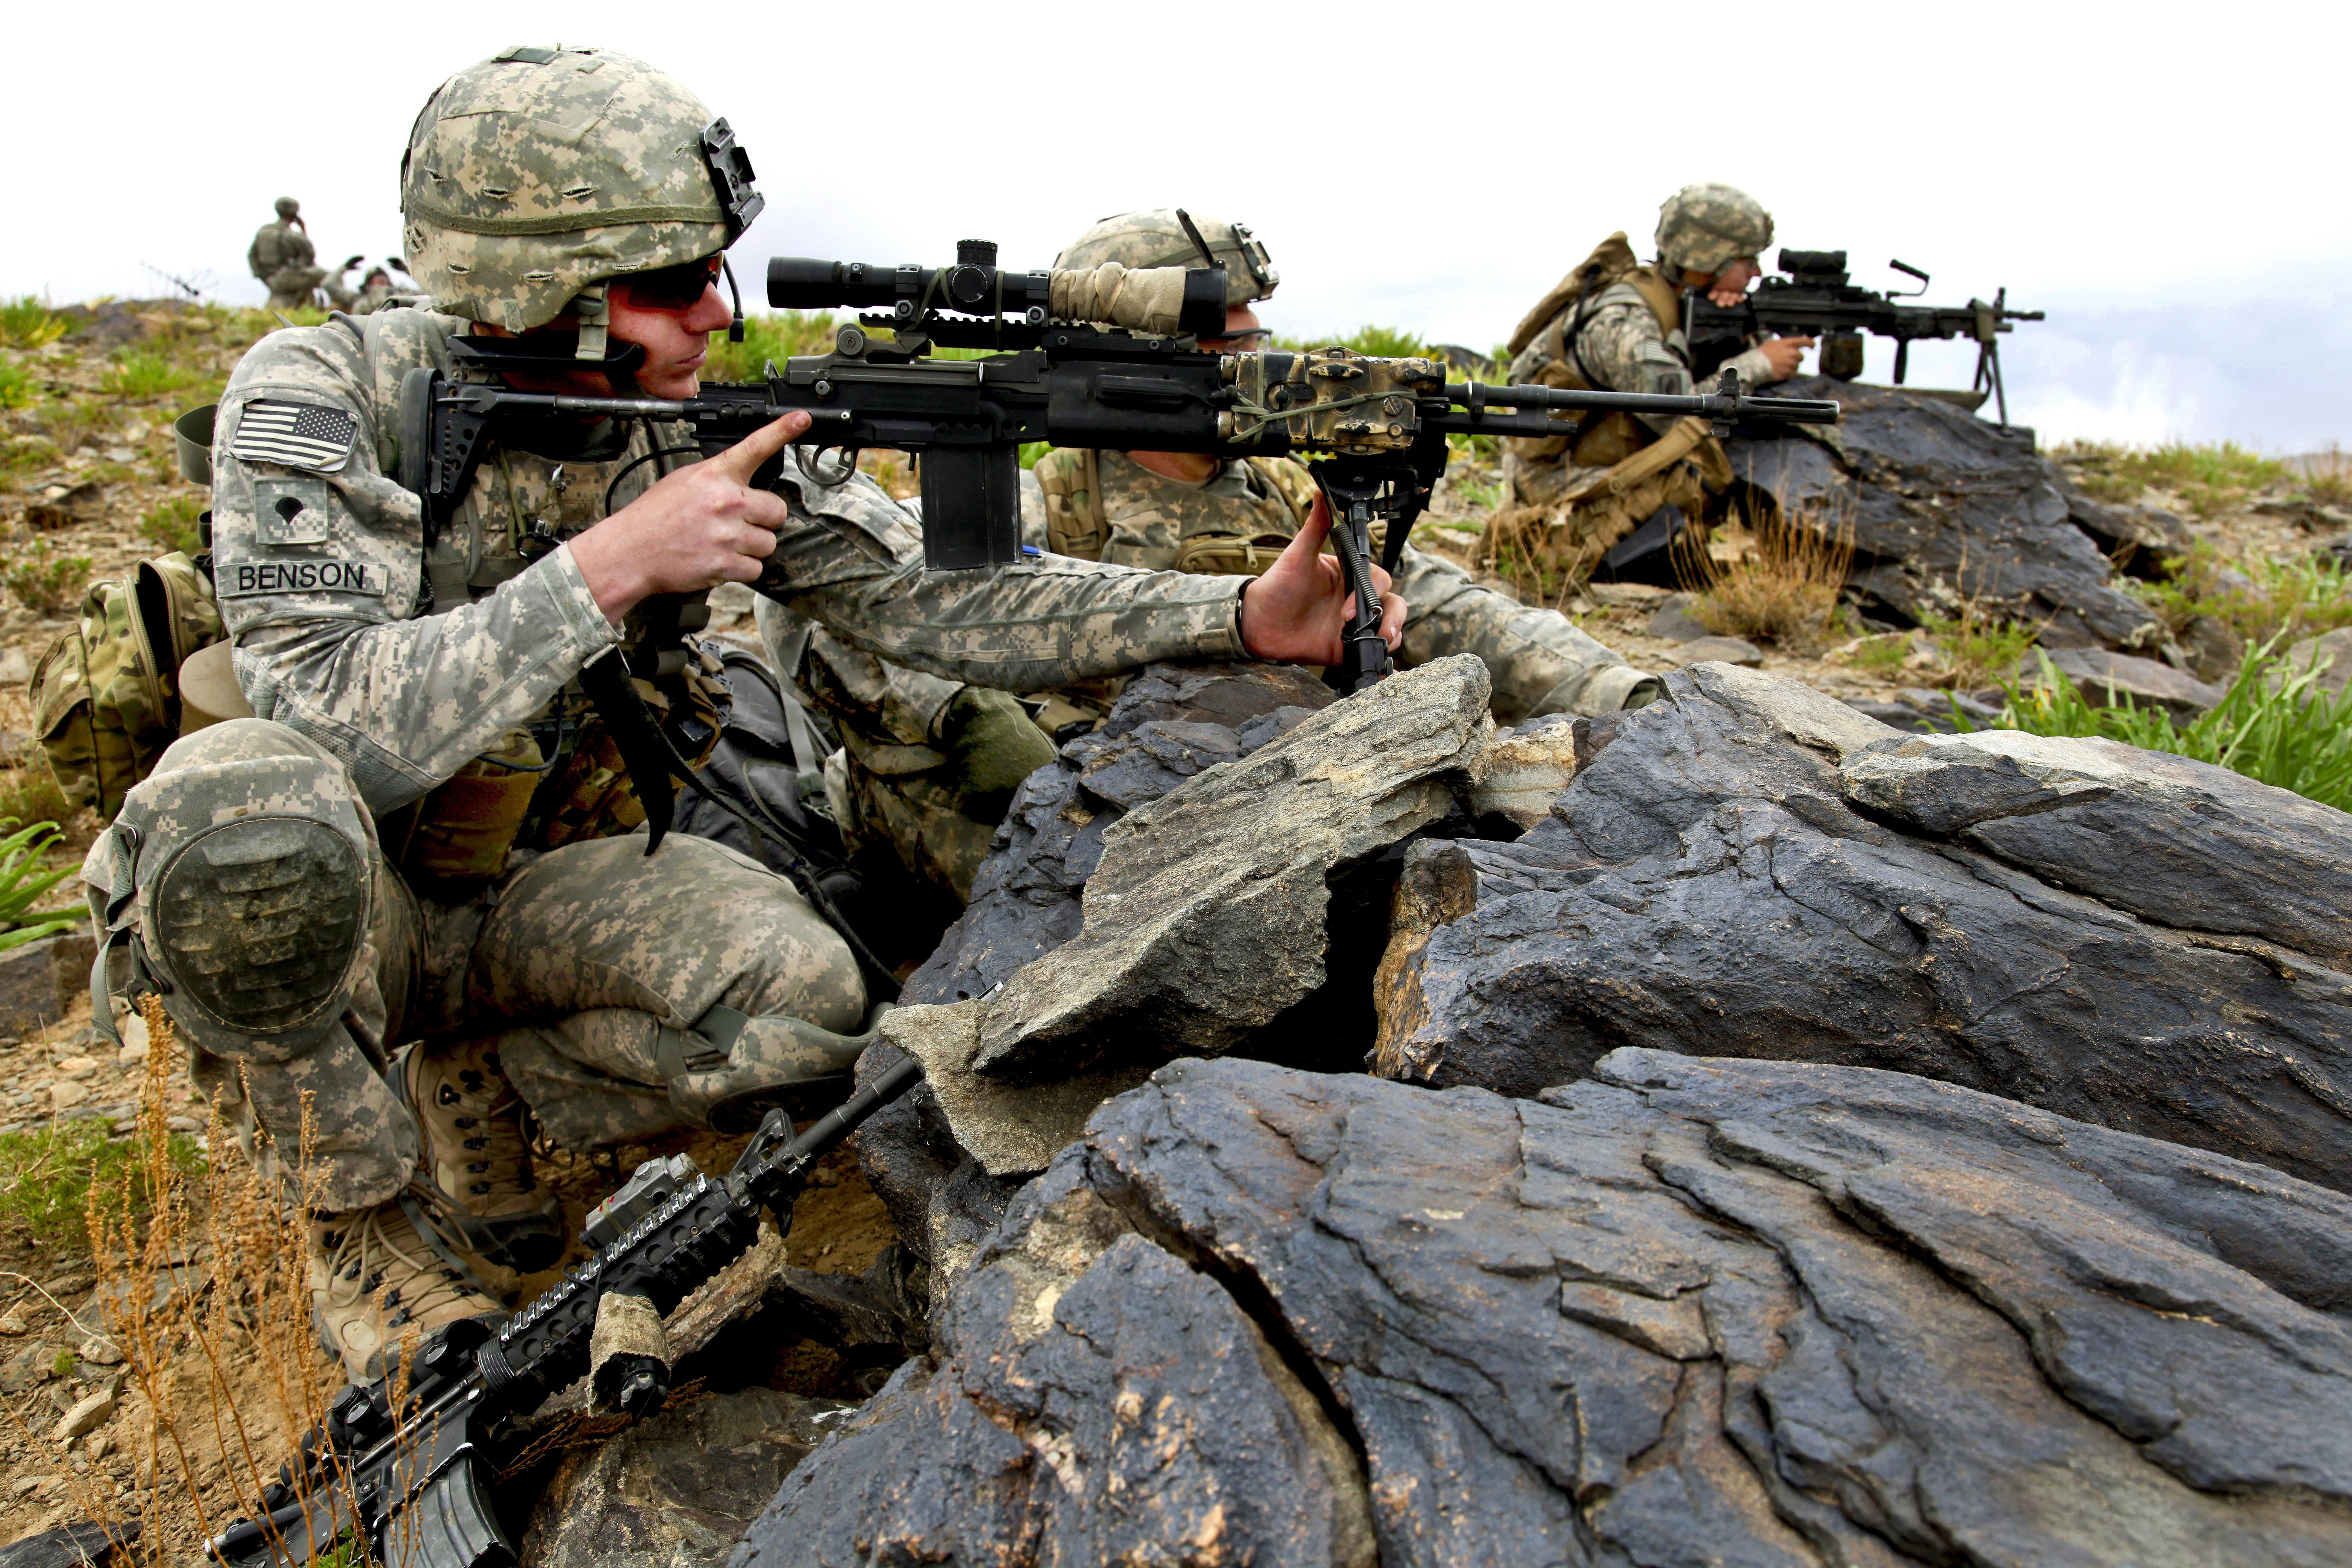 april 2010 army photos - year in photos